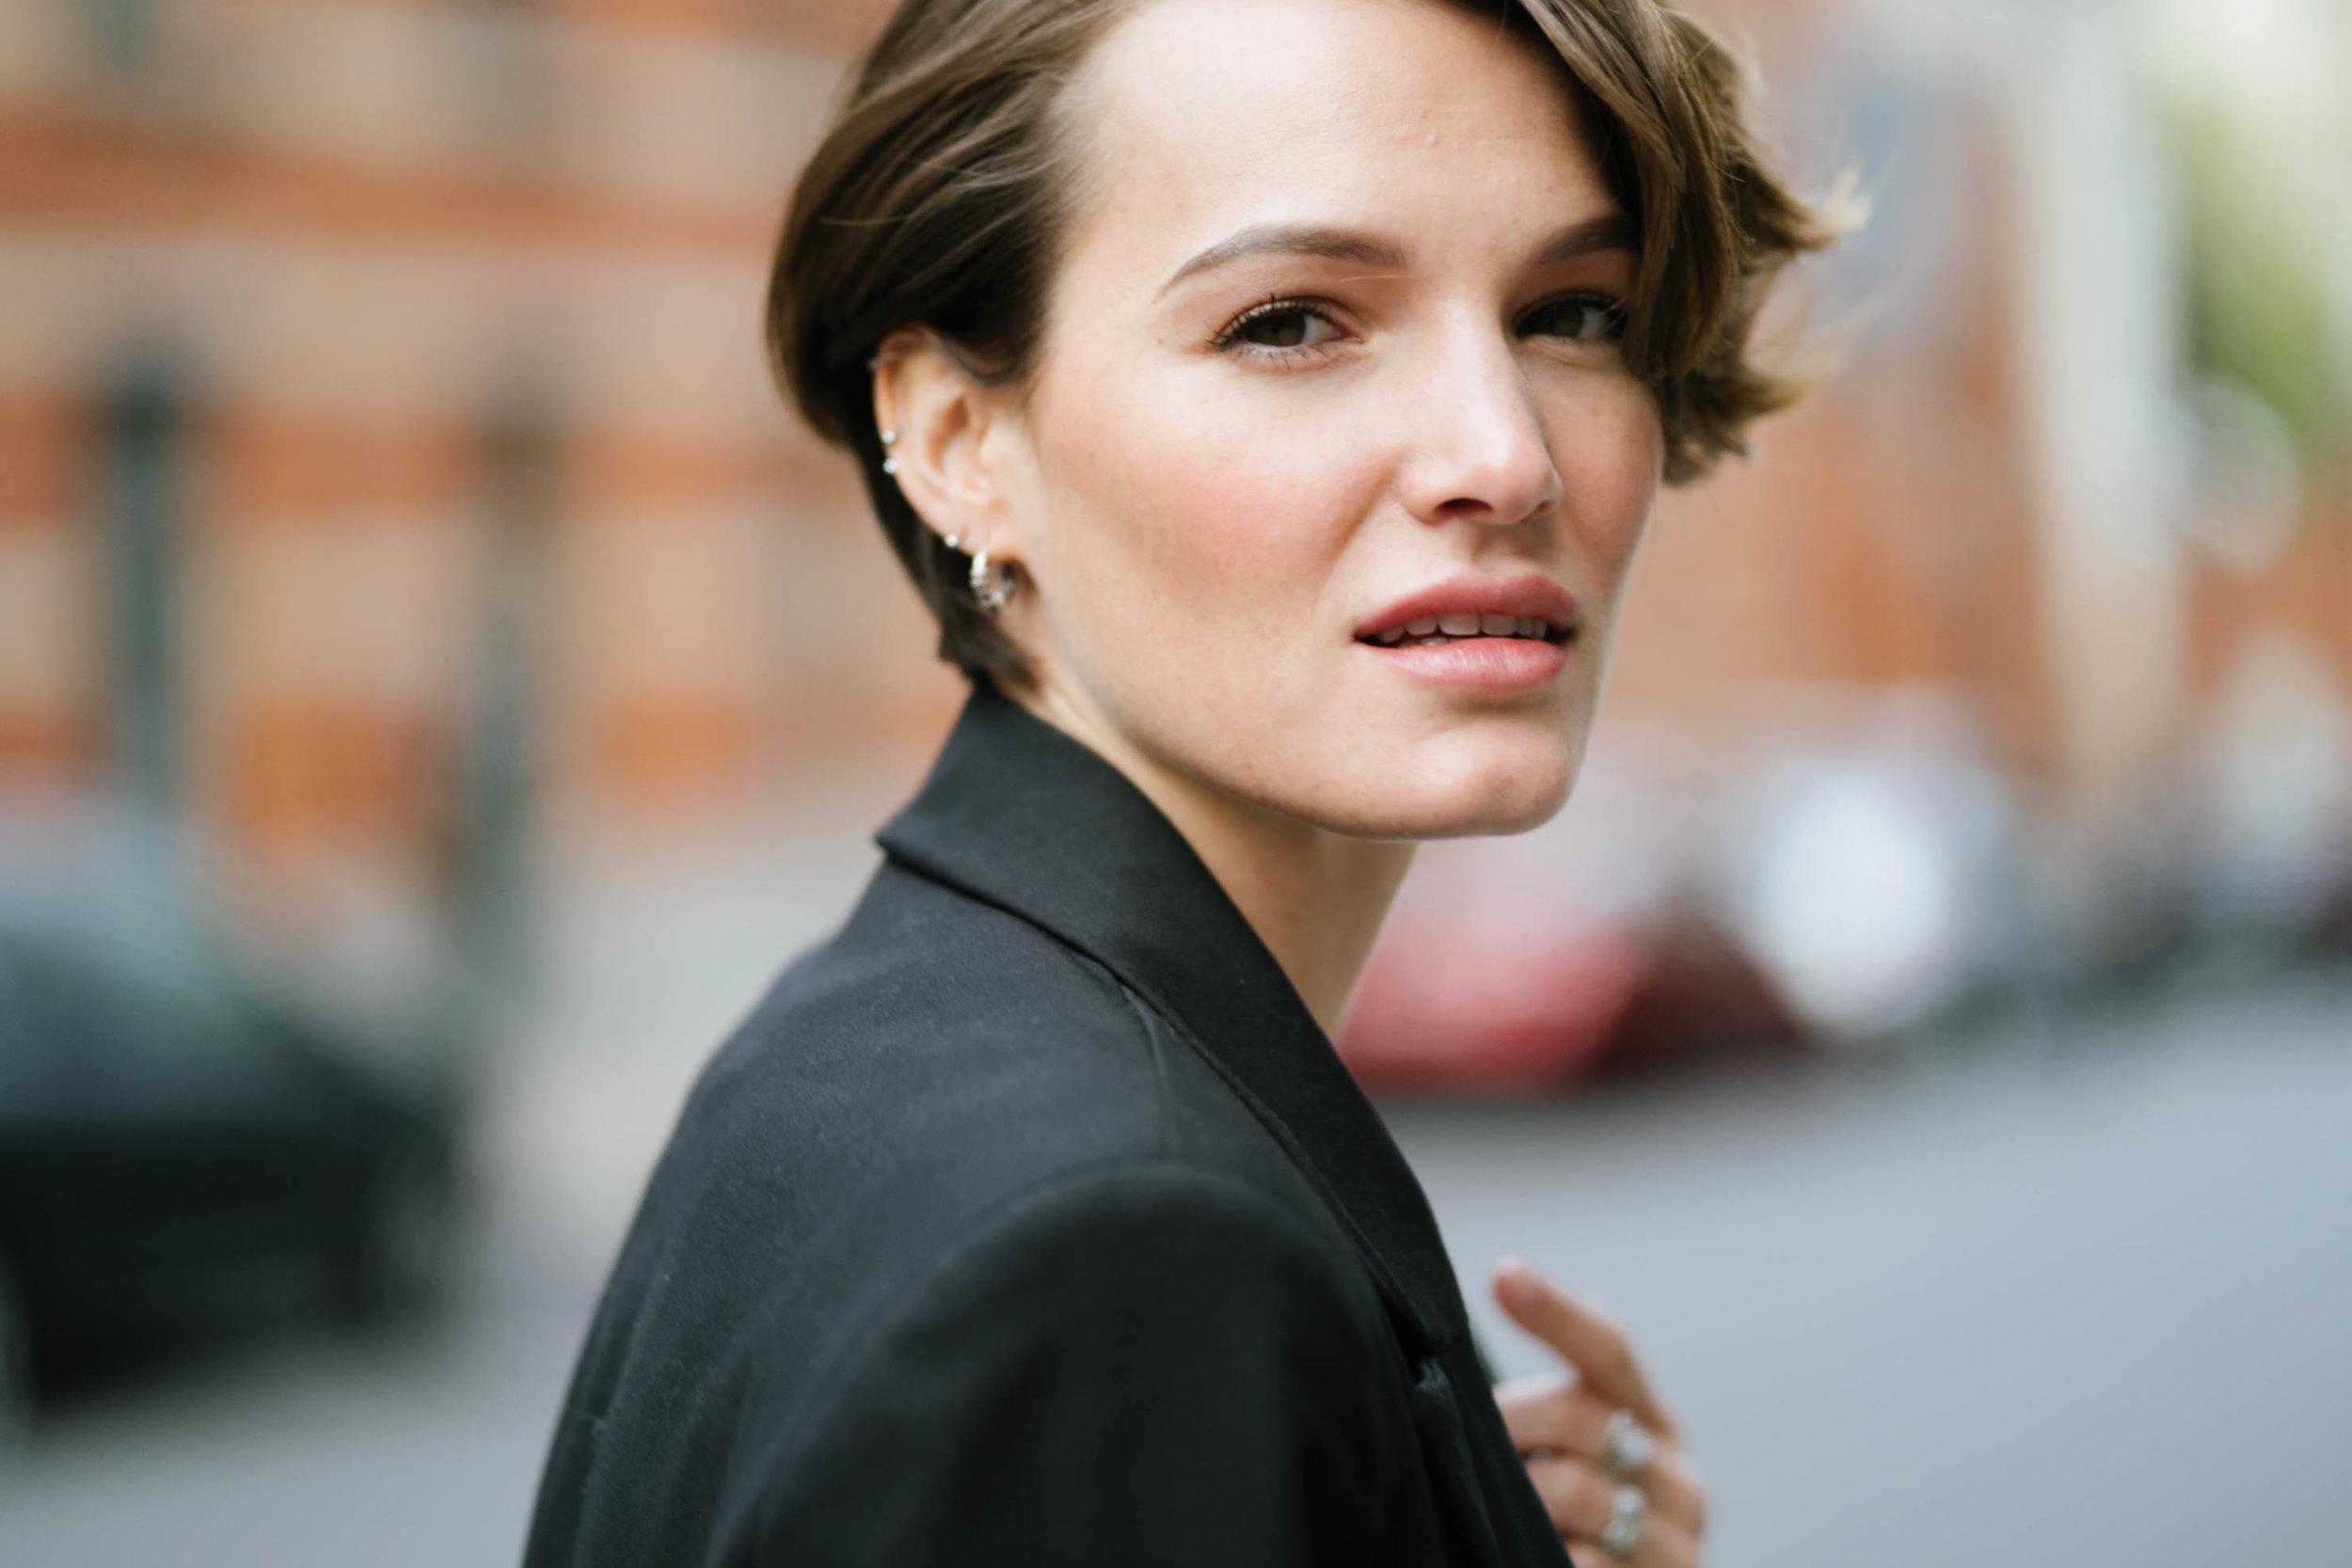 Amelia-portrait-photographe-videaste-bruxelles-3.jpg